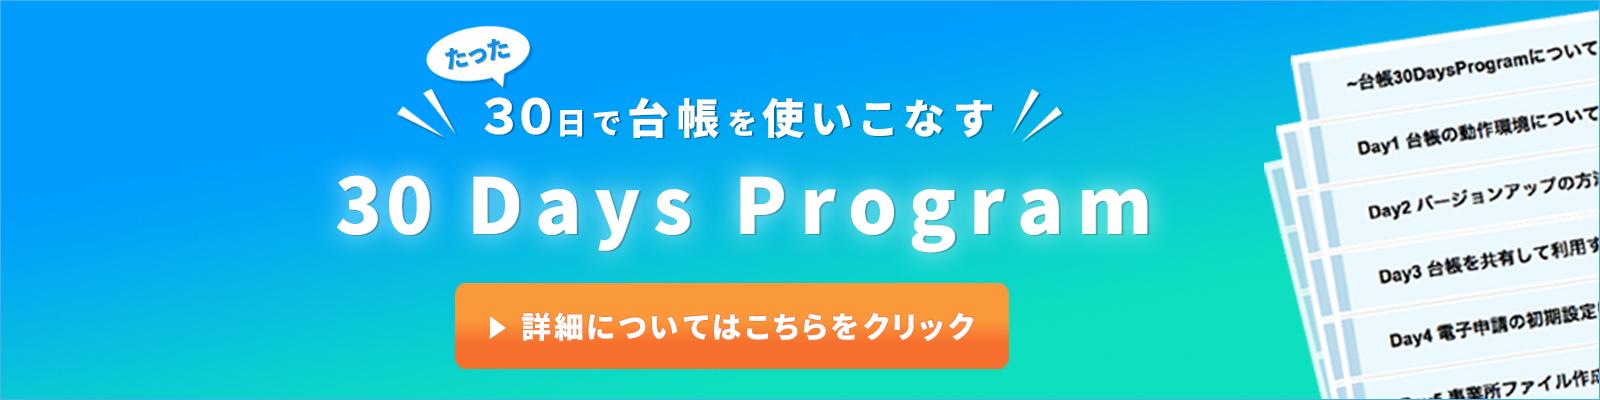 30daysprogram